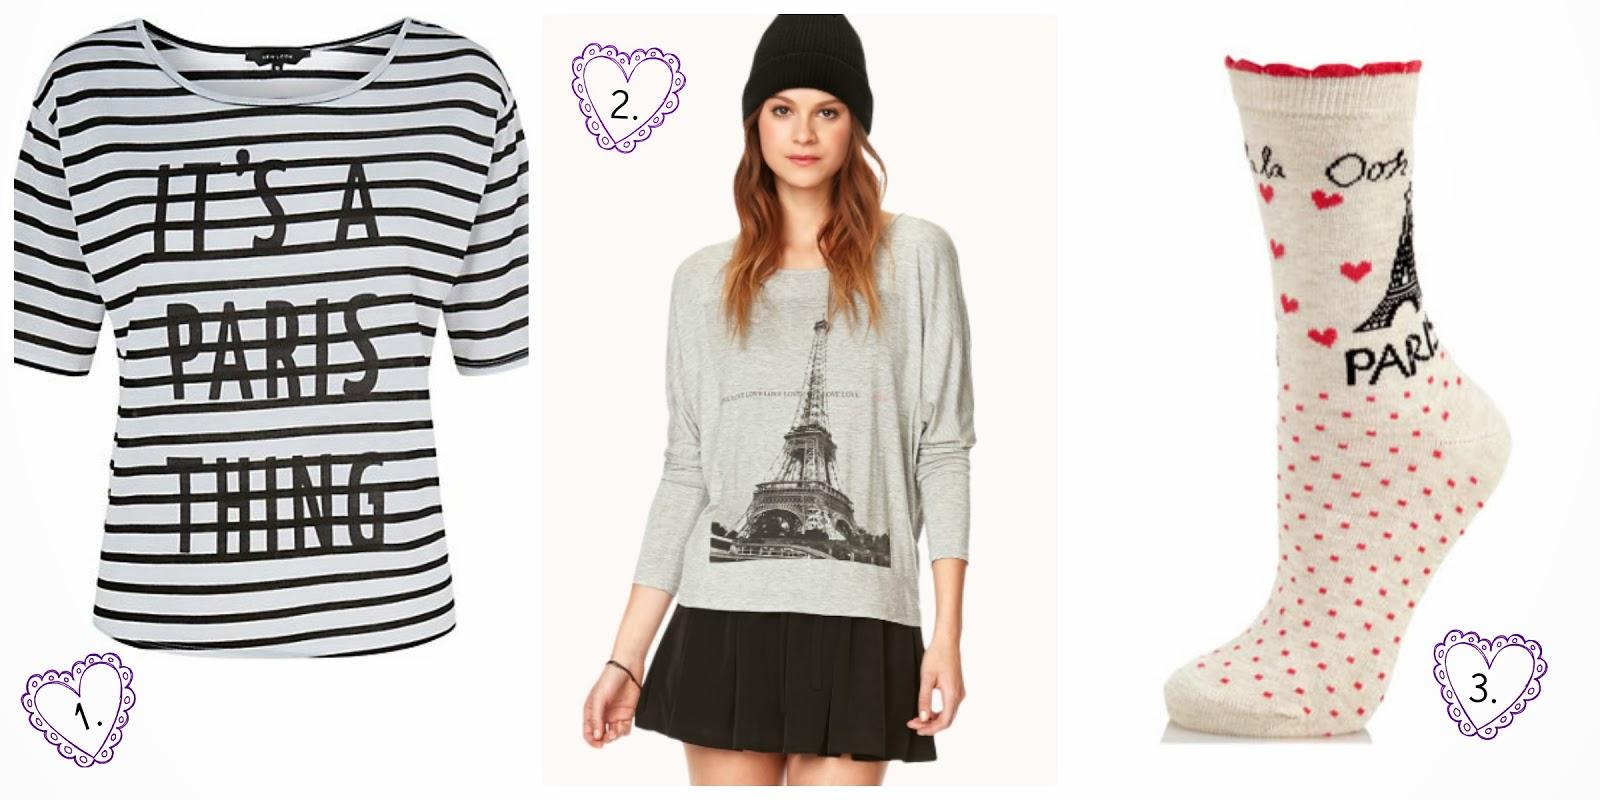 Parisian Wishlist New Look, Forever 21 & River Island